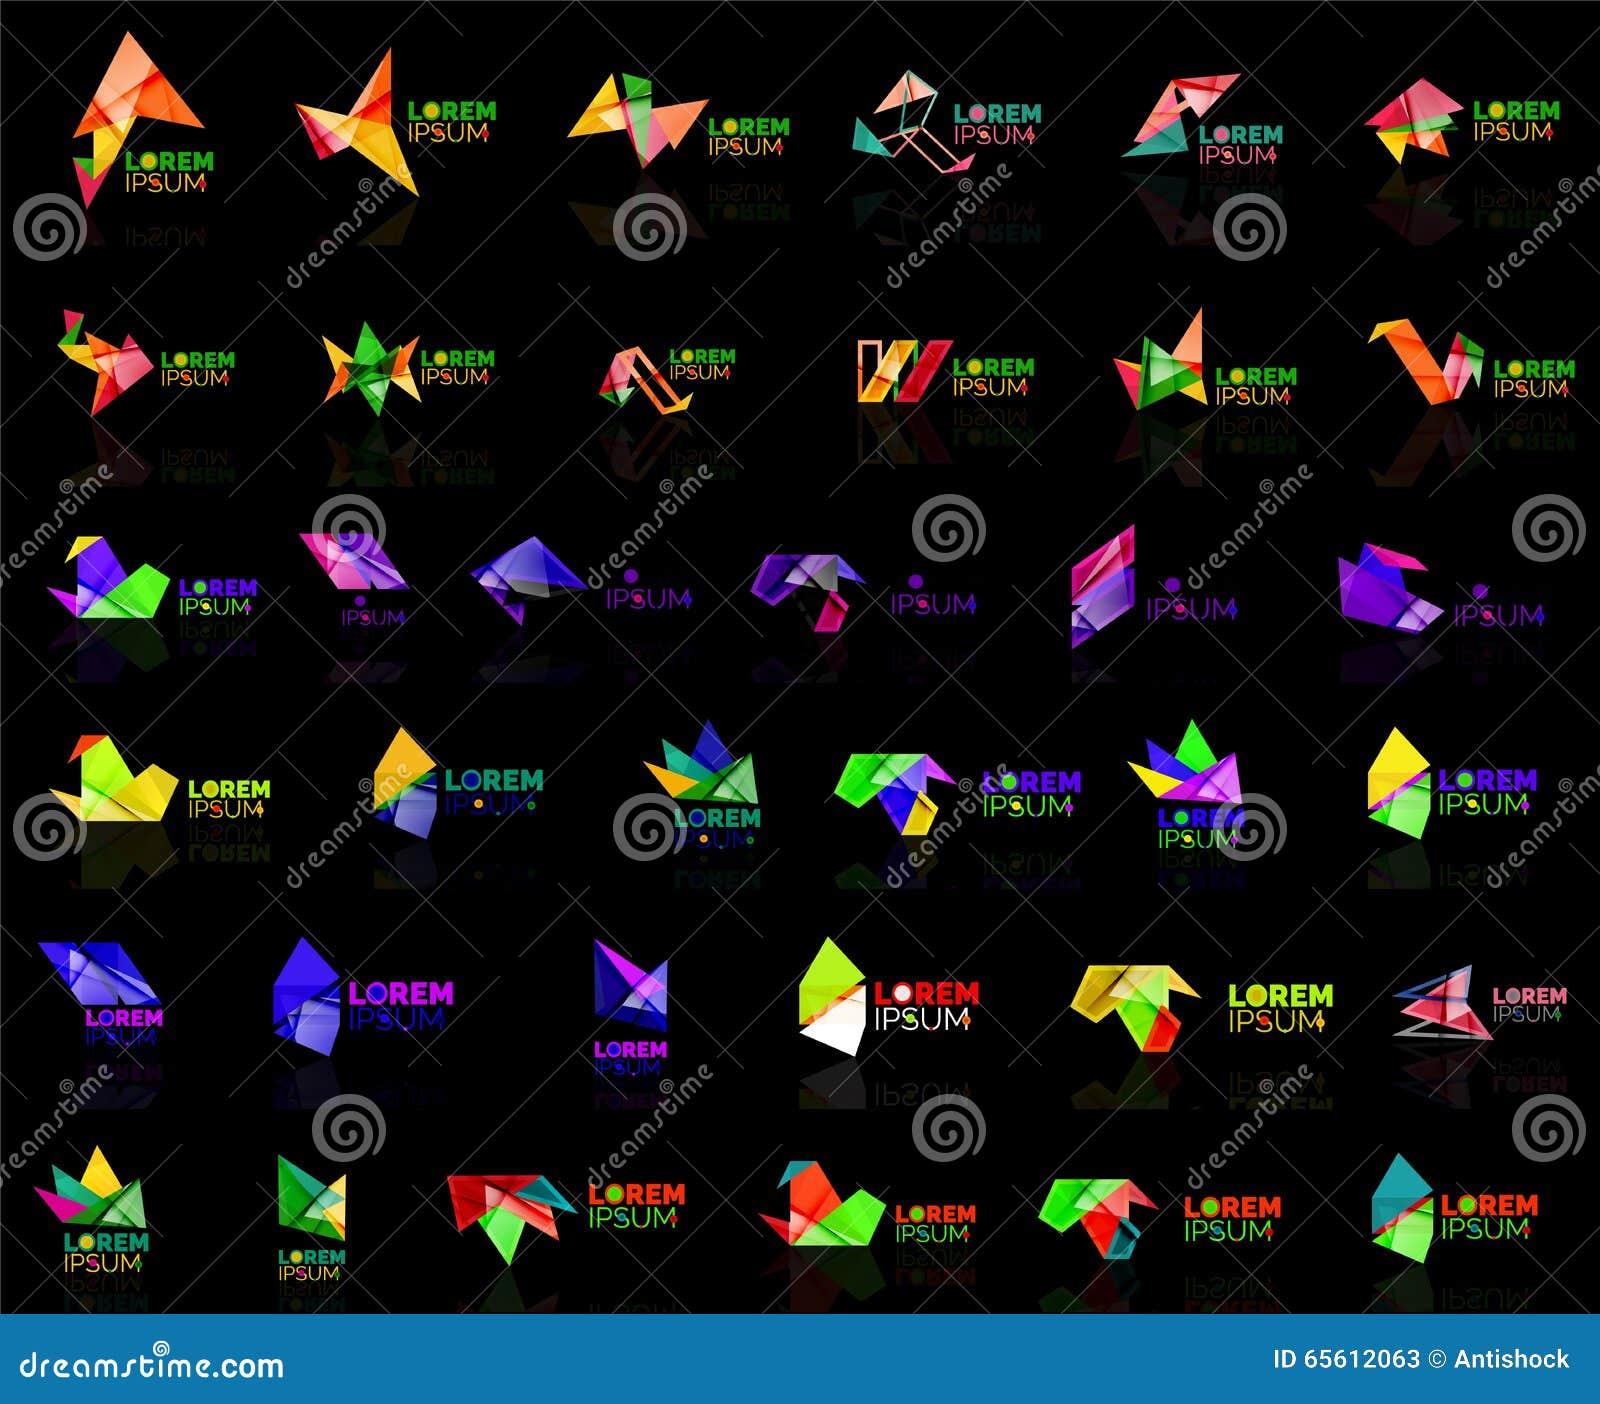 Grow Up Arrow Origami Abstract Vector Logo Design Template Paper